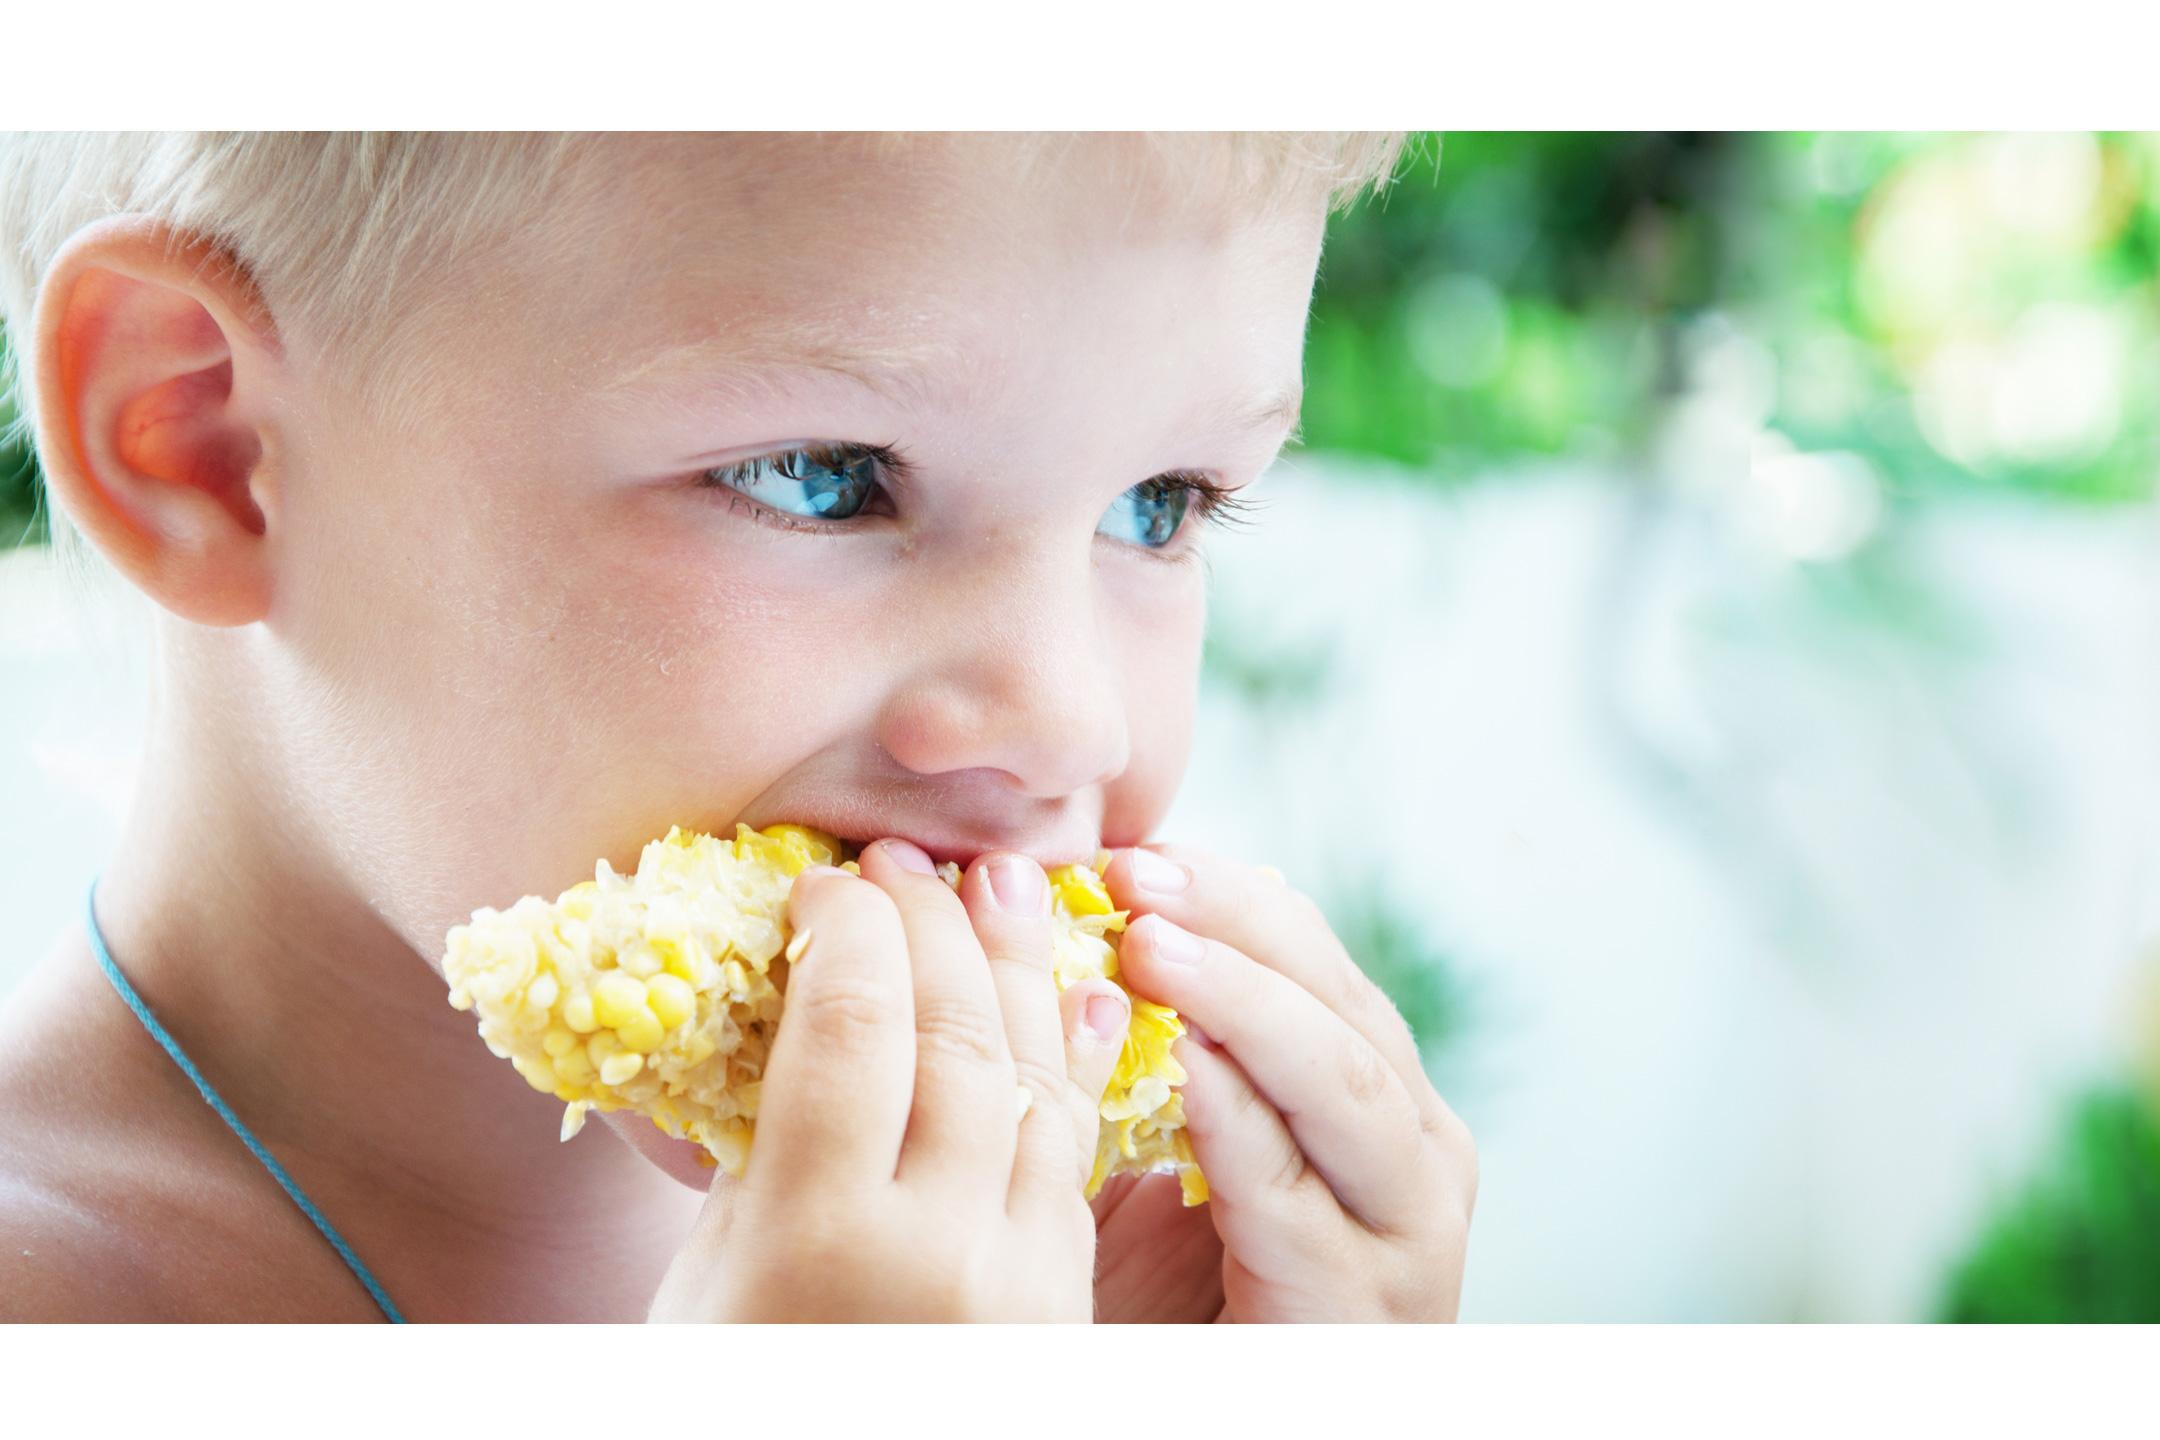 boy-eating-corncob-2160